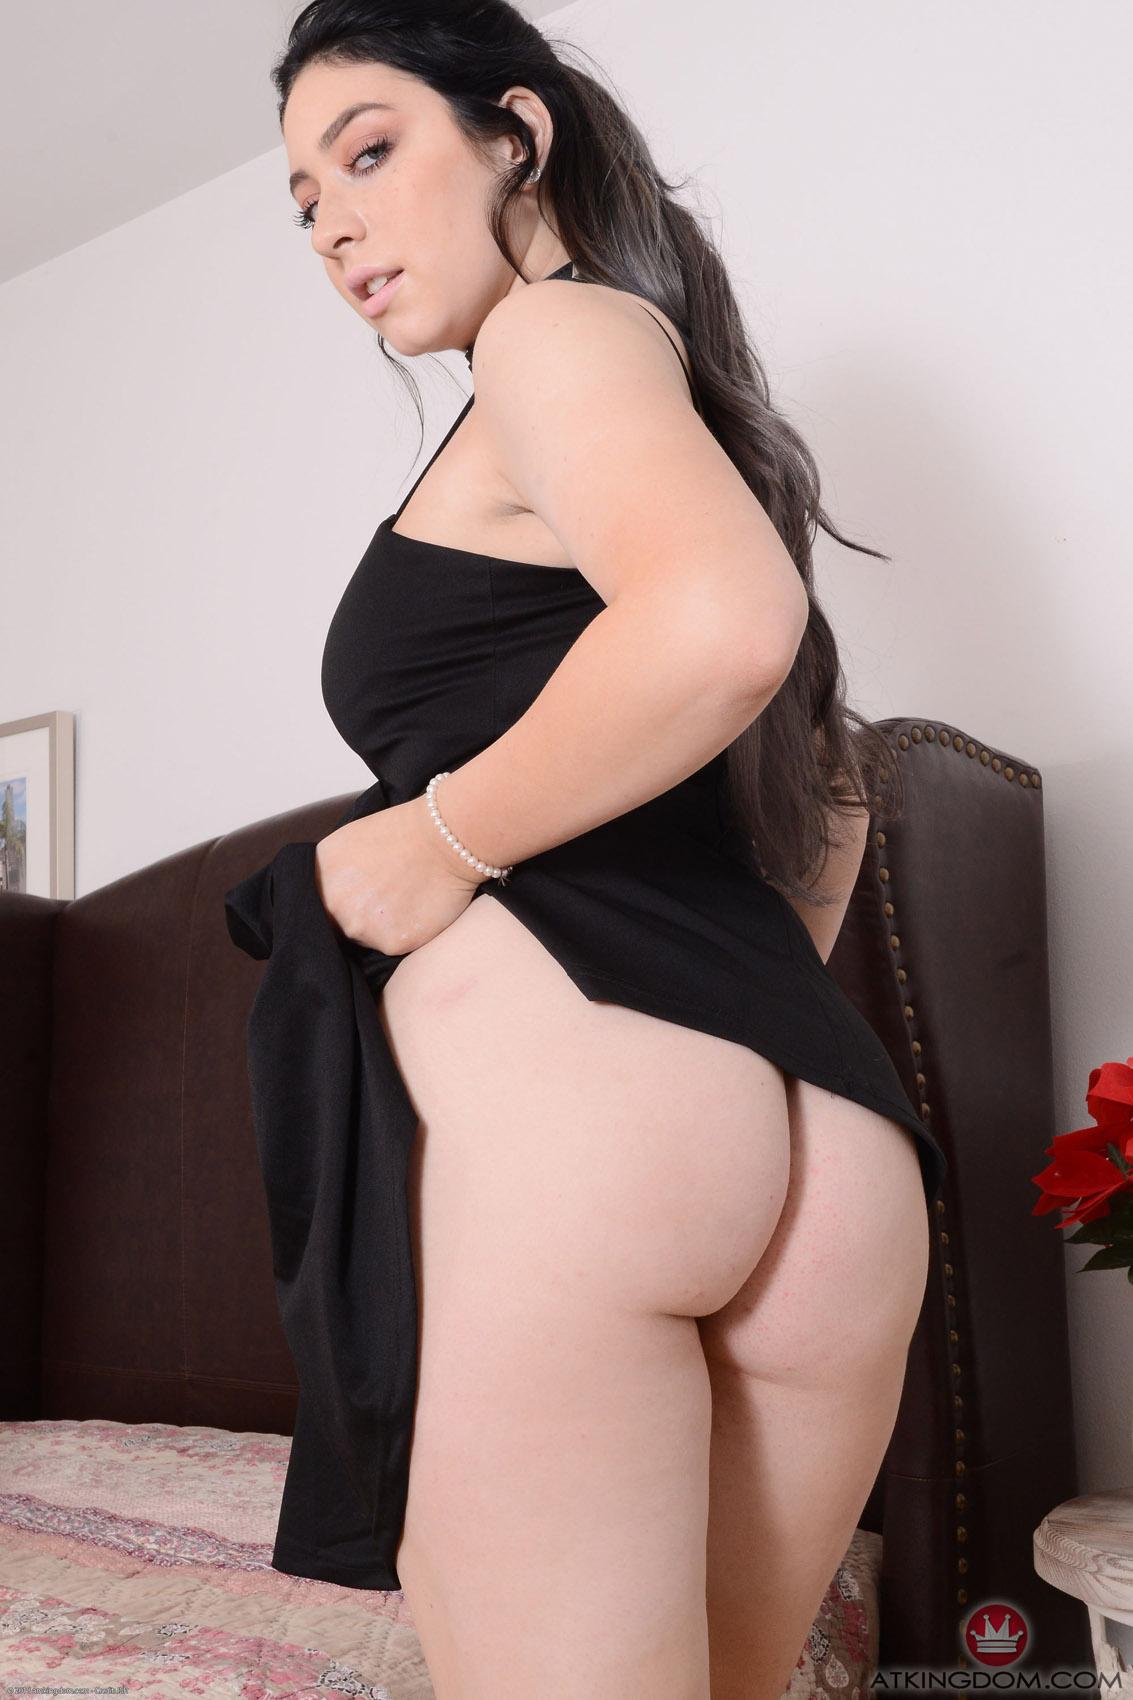 Amilia Onyx Black Dress Nude AMKingdom pics and vids ...